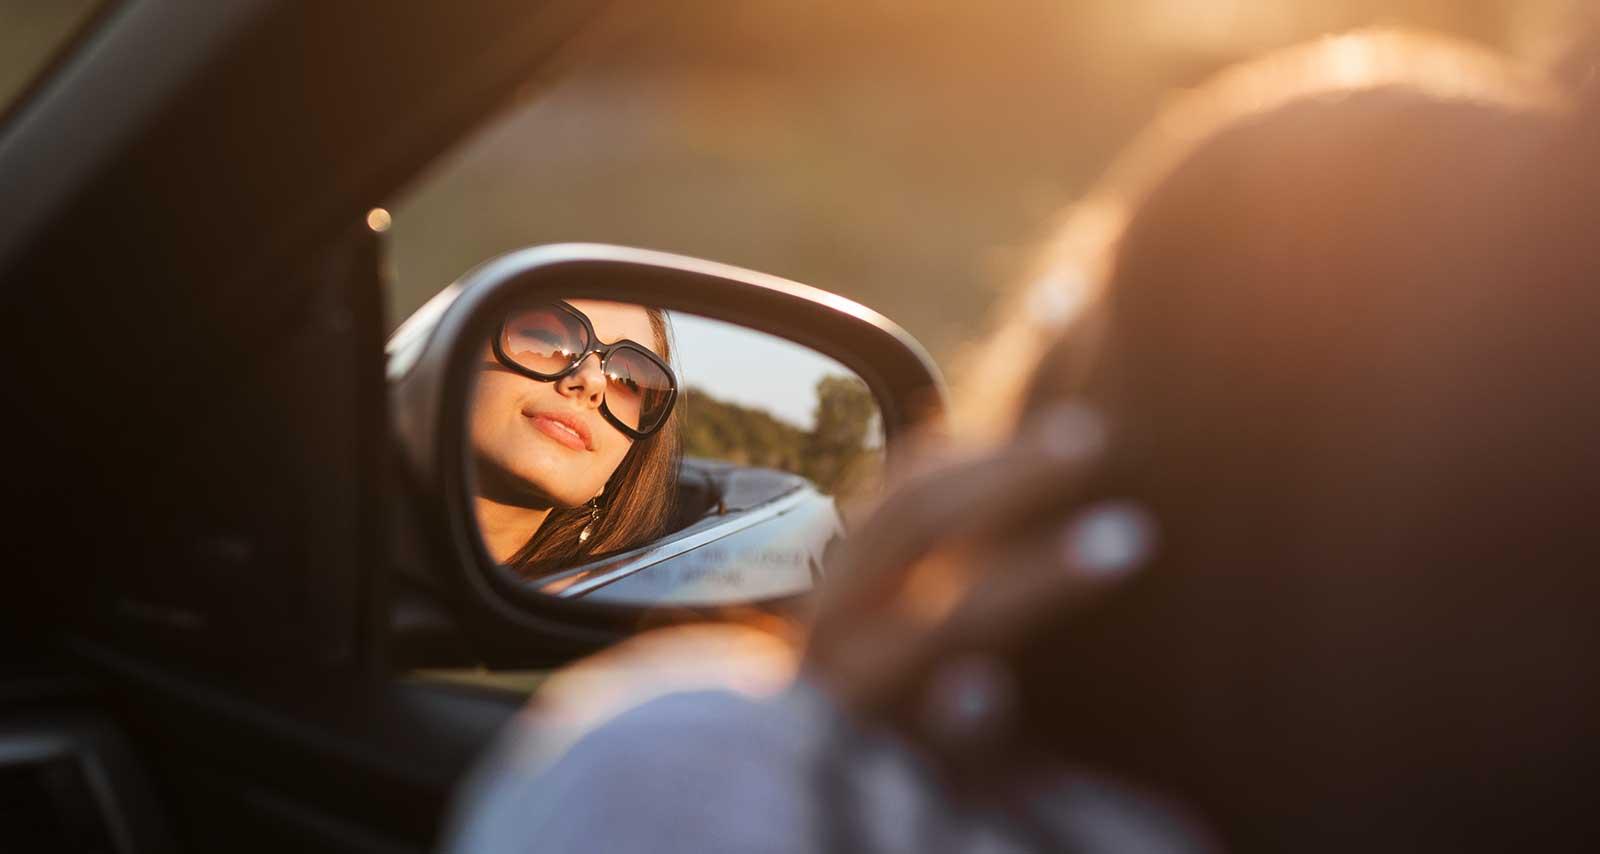 Frau genießt Autofahrt im Auto-Abo.